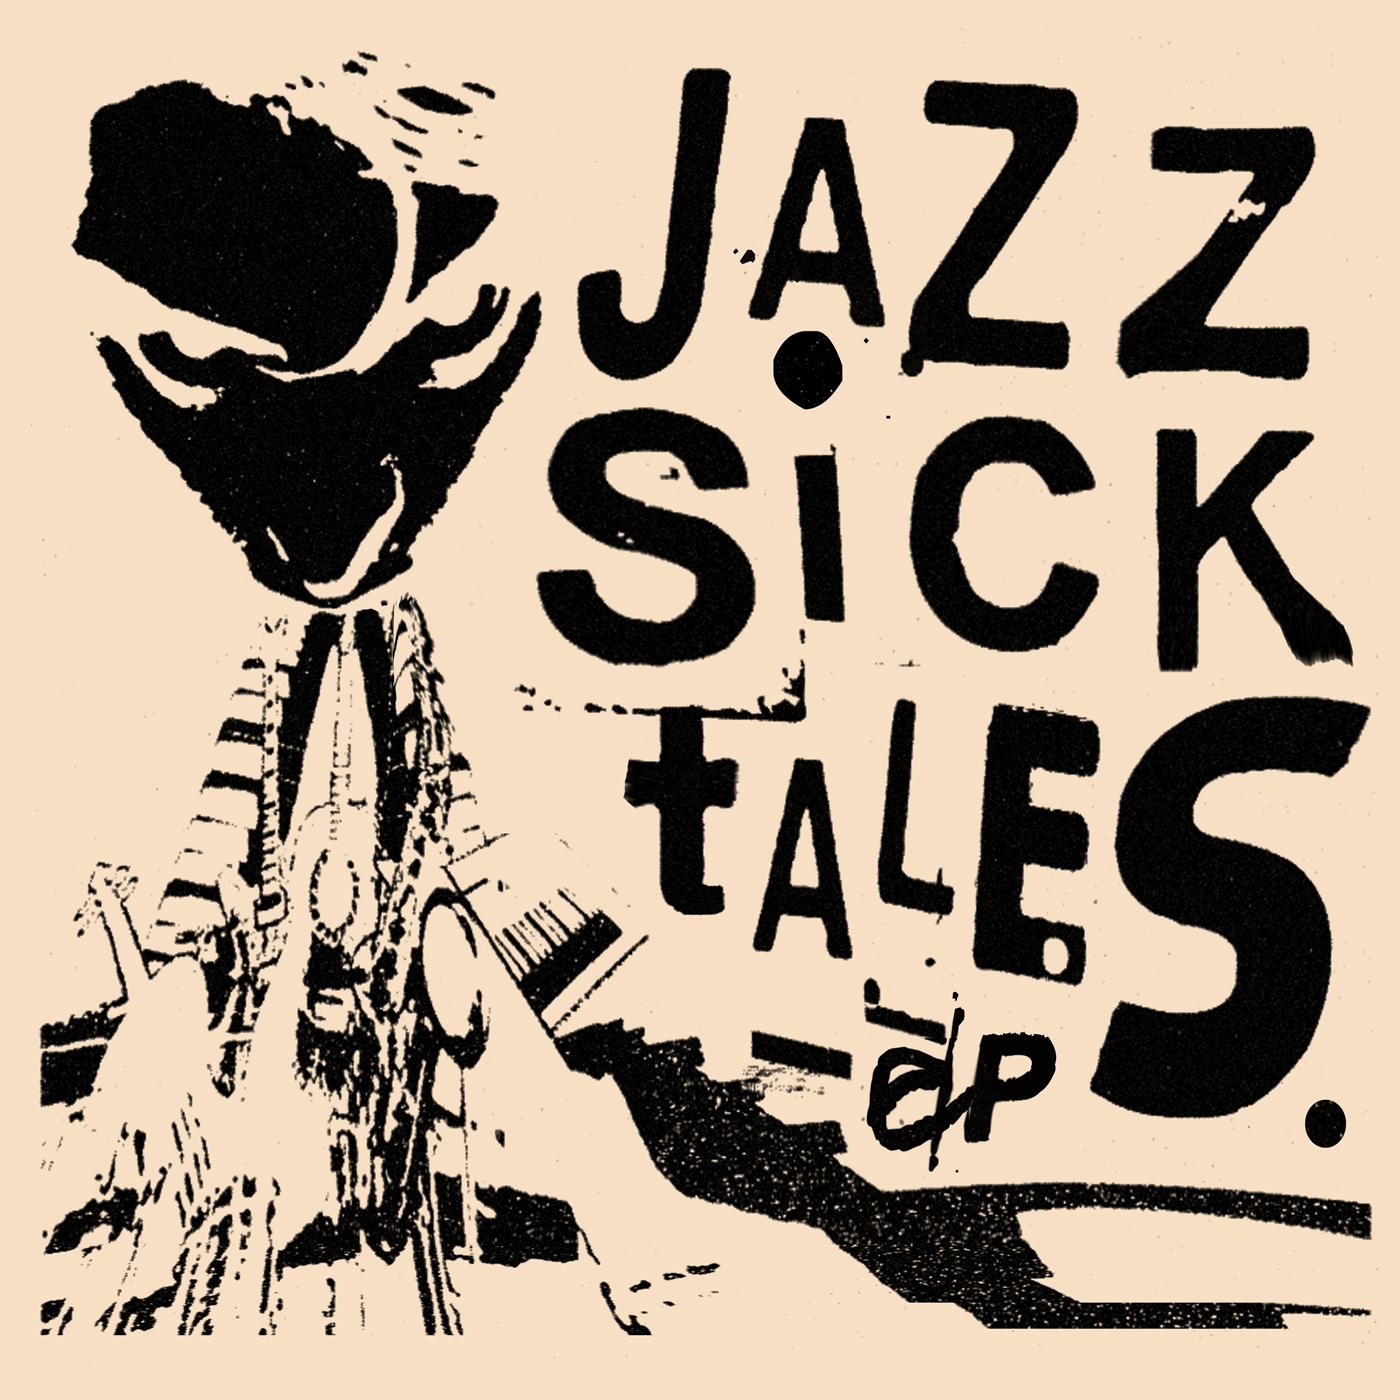 Jazzsic - Jazz Sick Tales EP